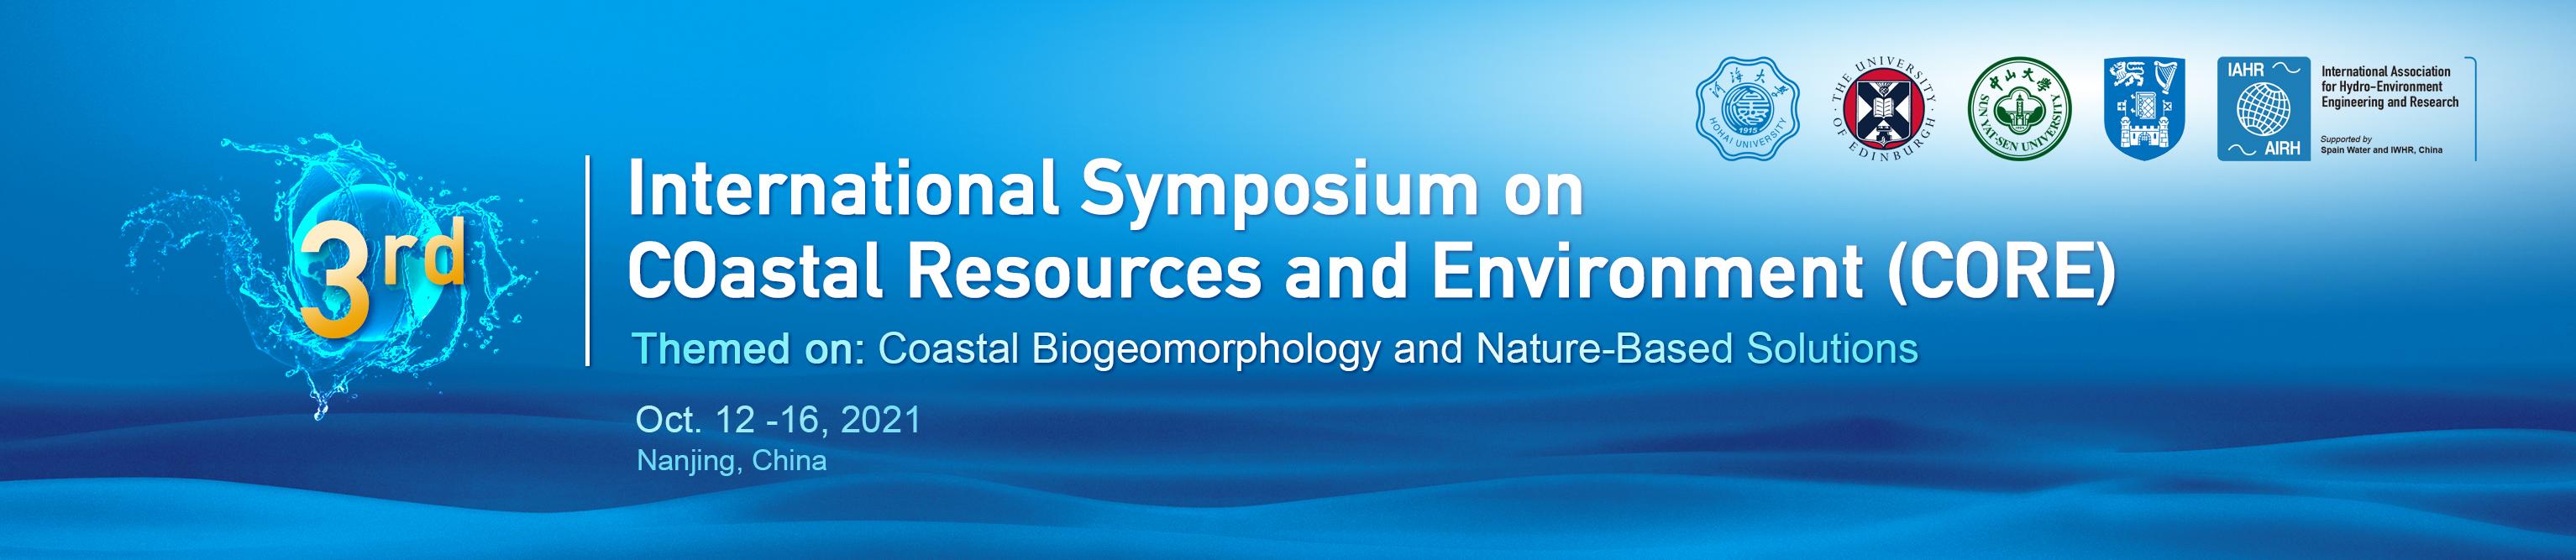 International Symposium on Coastal Resources and Environment (CORE2021)